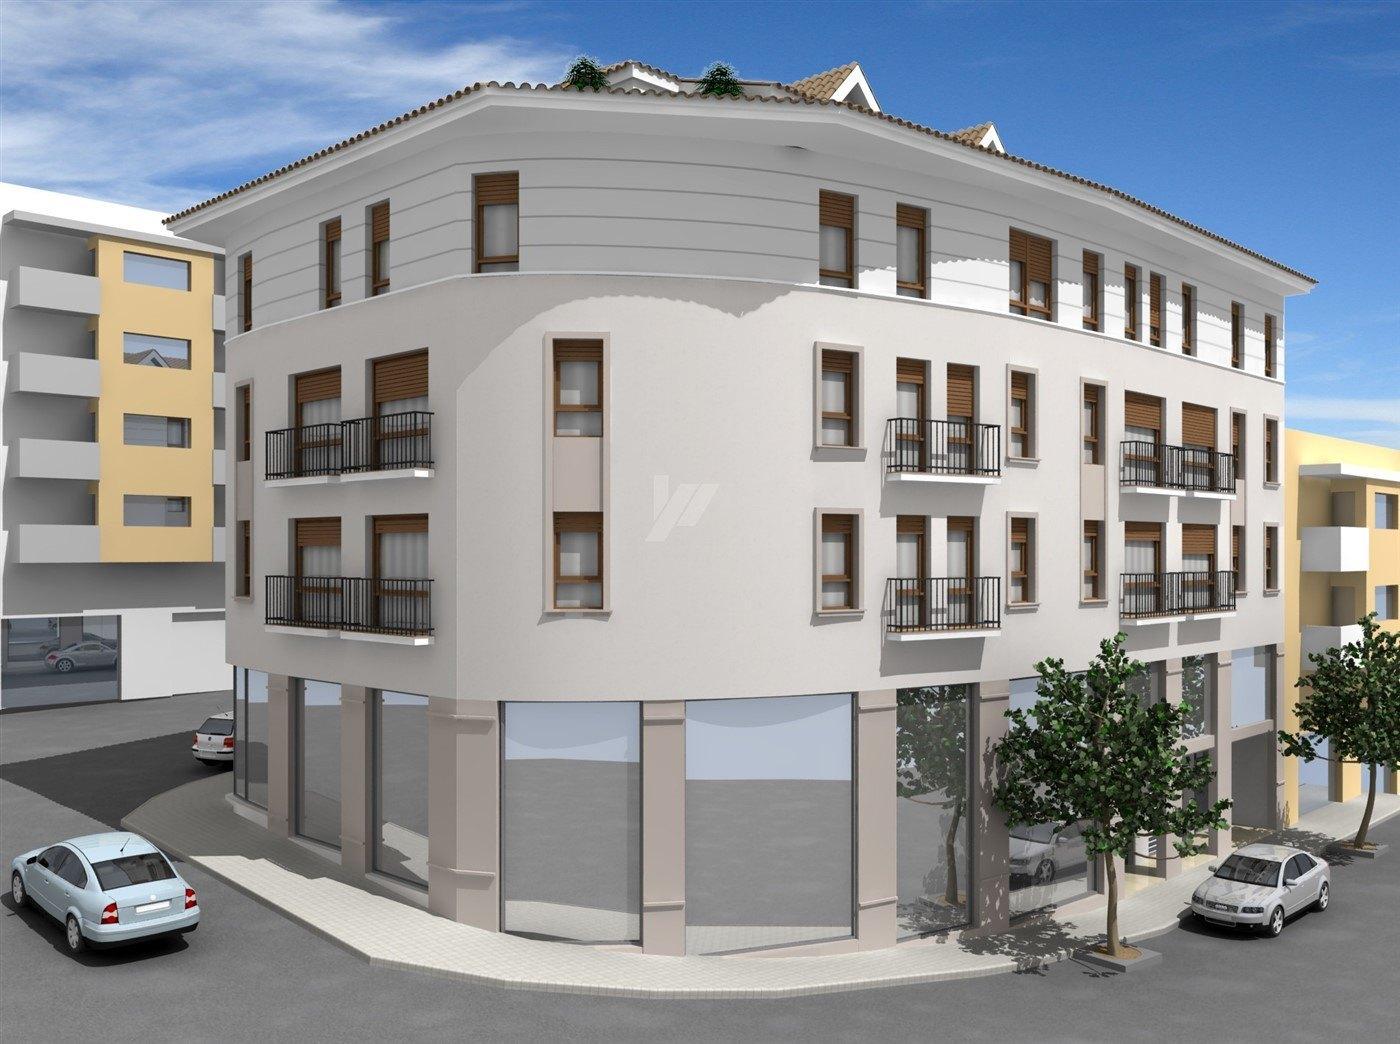 Neubauwohnung zum Verkauf in Moraira, Costa Blanca.